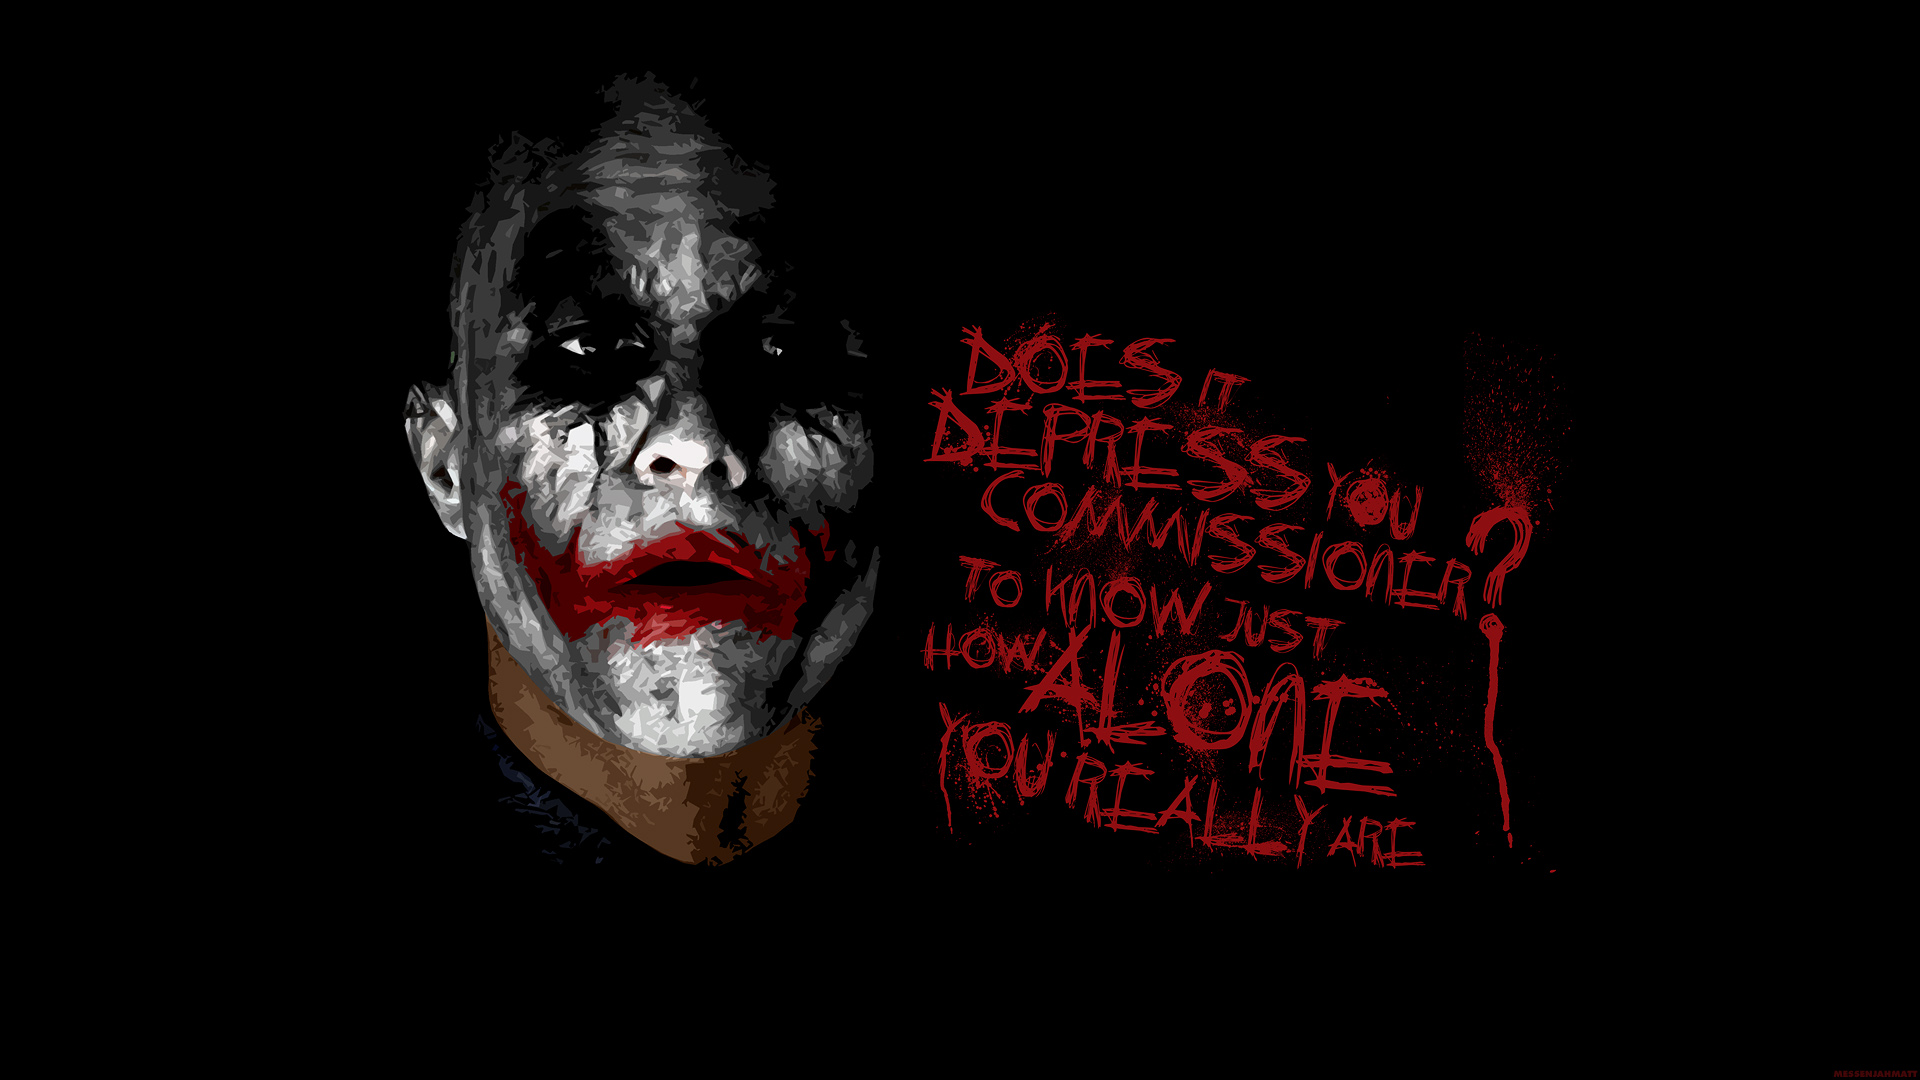 Joker Wallpapers Hd wallpaper   1113635 1920x1080